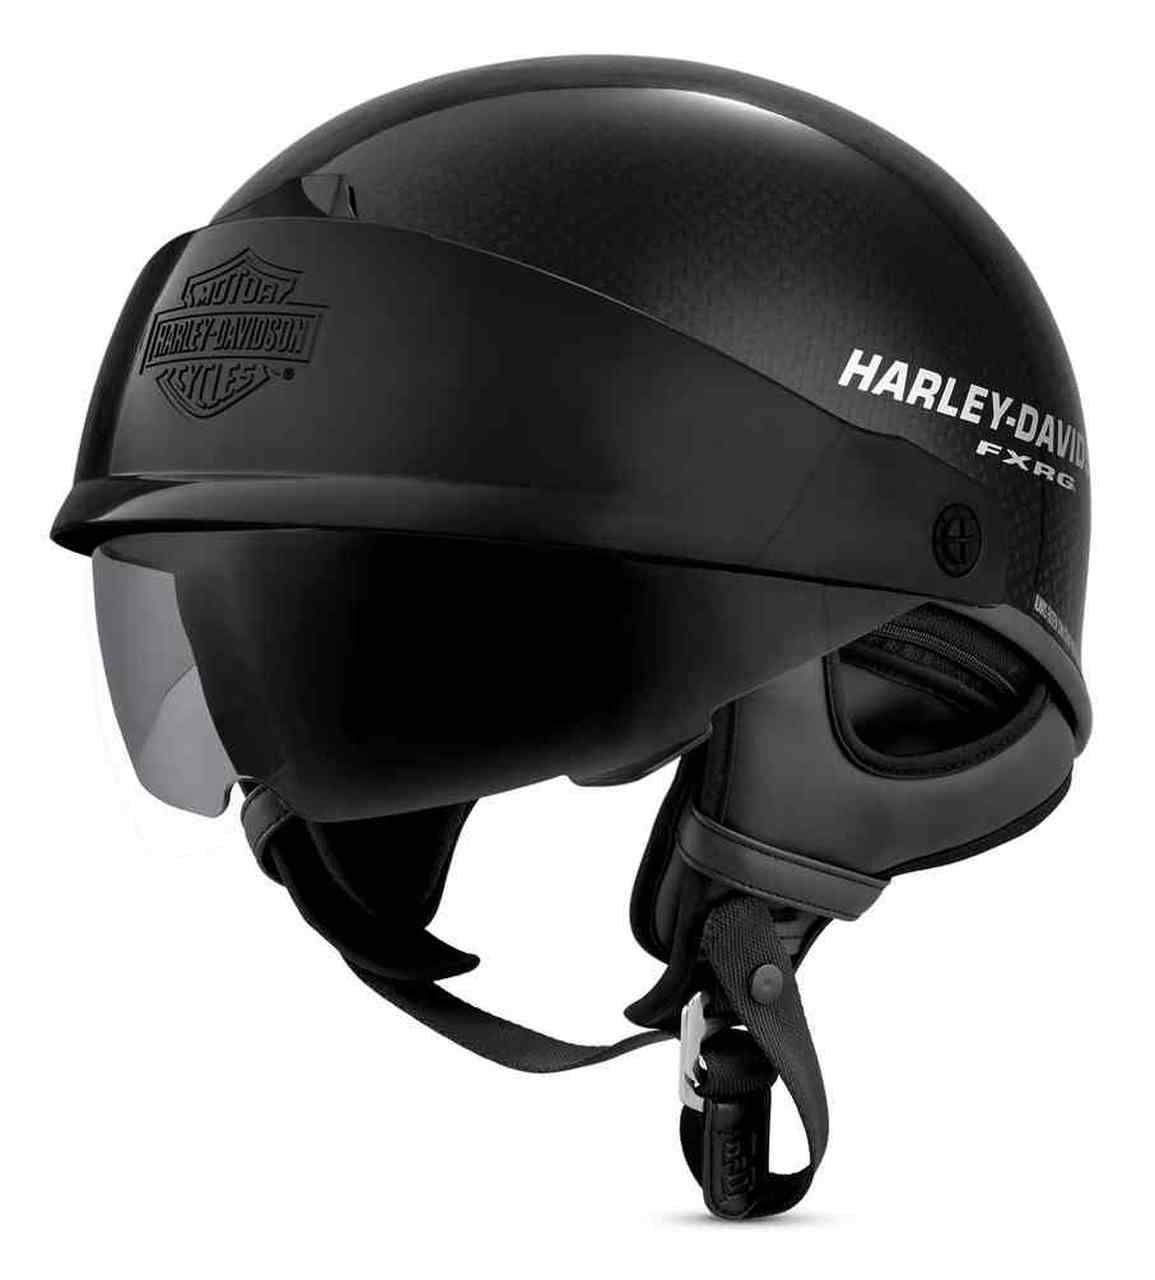 Harley-Davidson® Men's FXRG J07 Carbon Fiber Half Helmet, Gloss Black